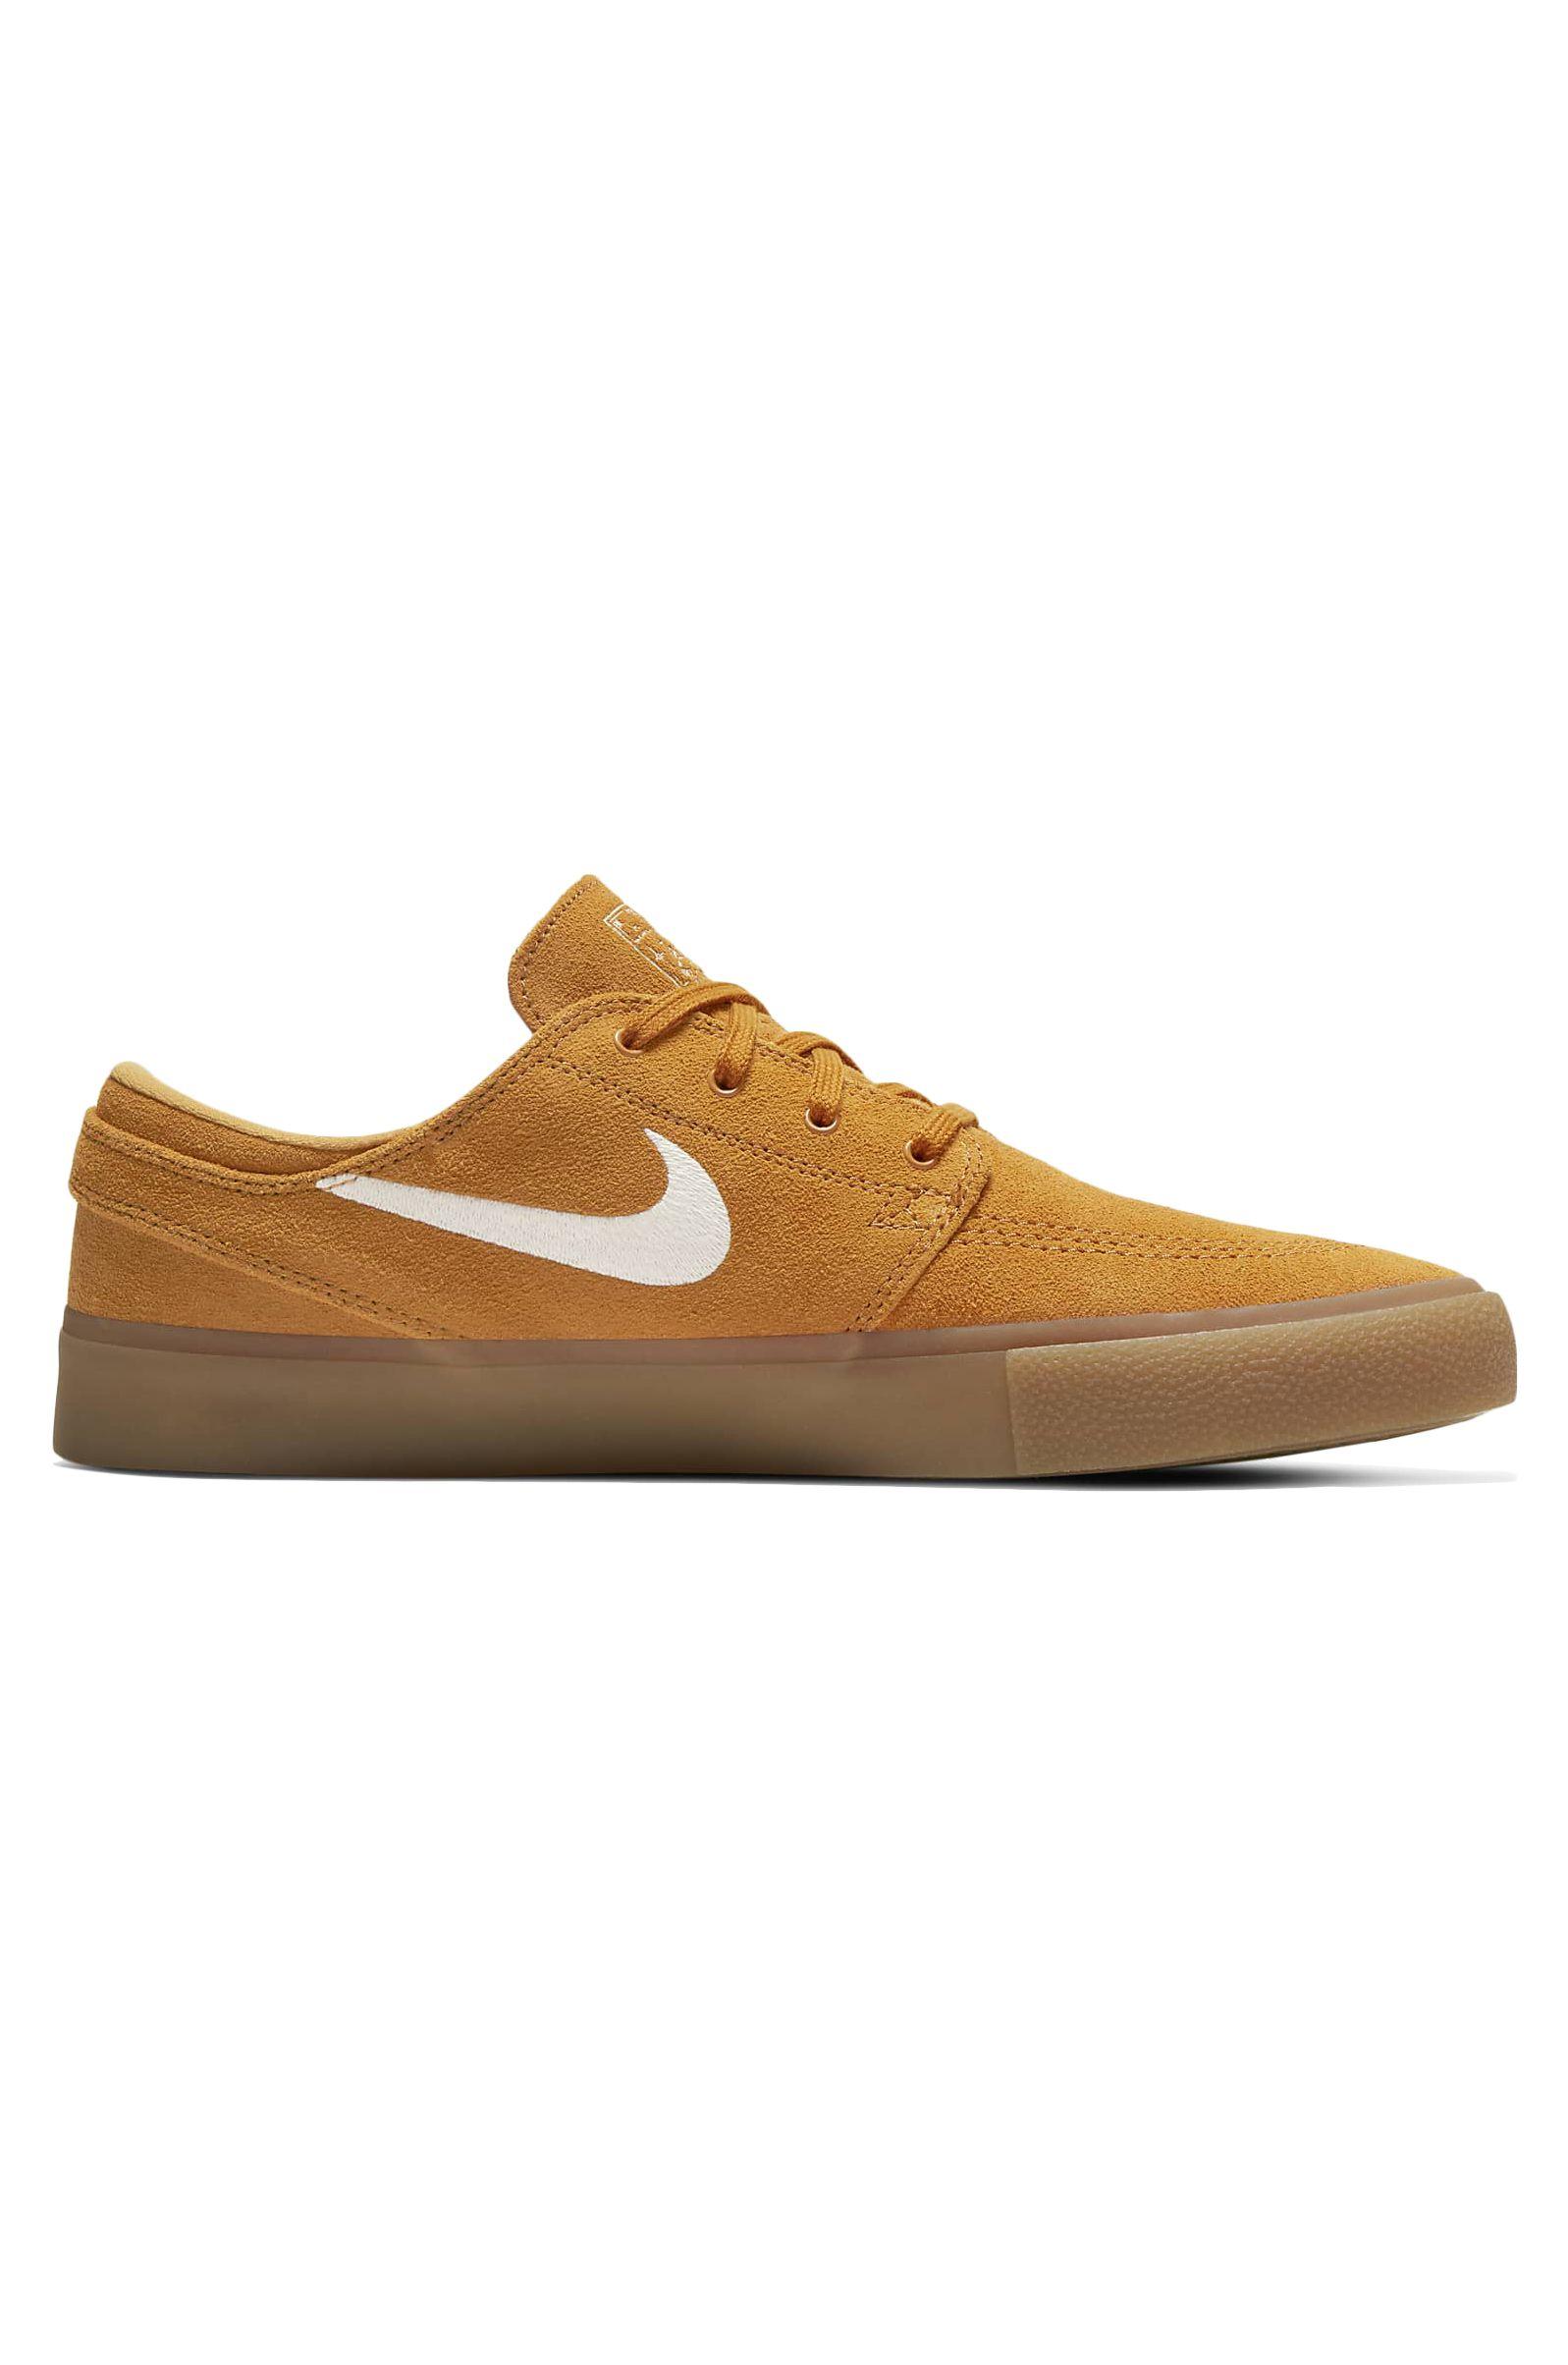 Nike Sb Shoes NIKE SB ZOOM JANOSKI RM Chutney/Sail-Chutney-Gum Lt Brown